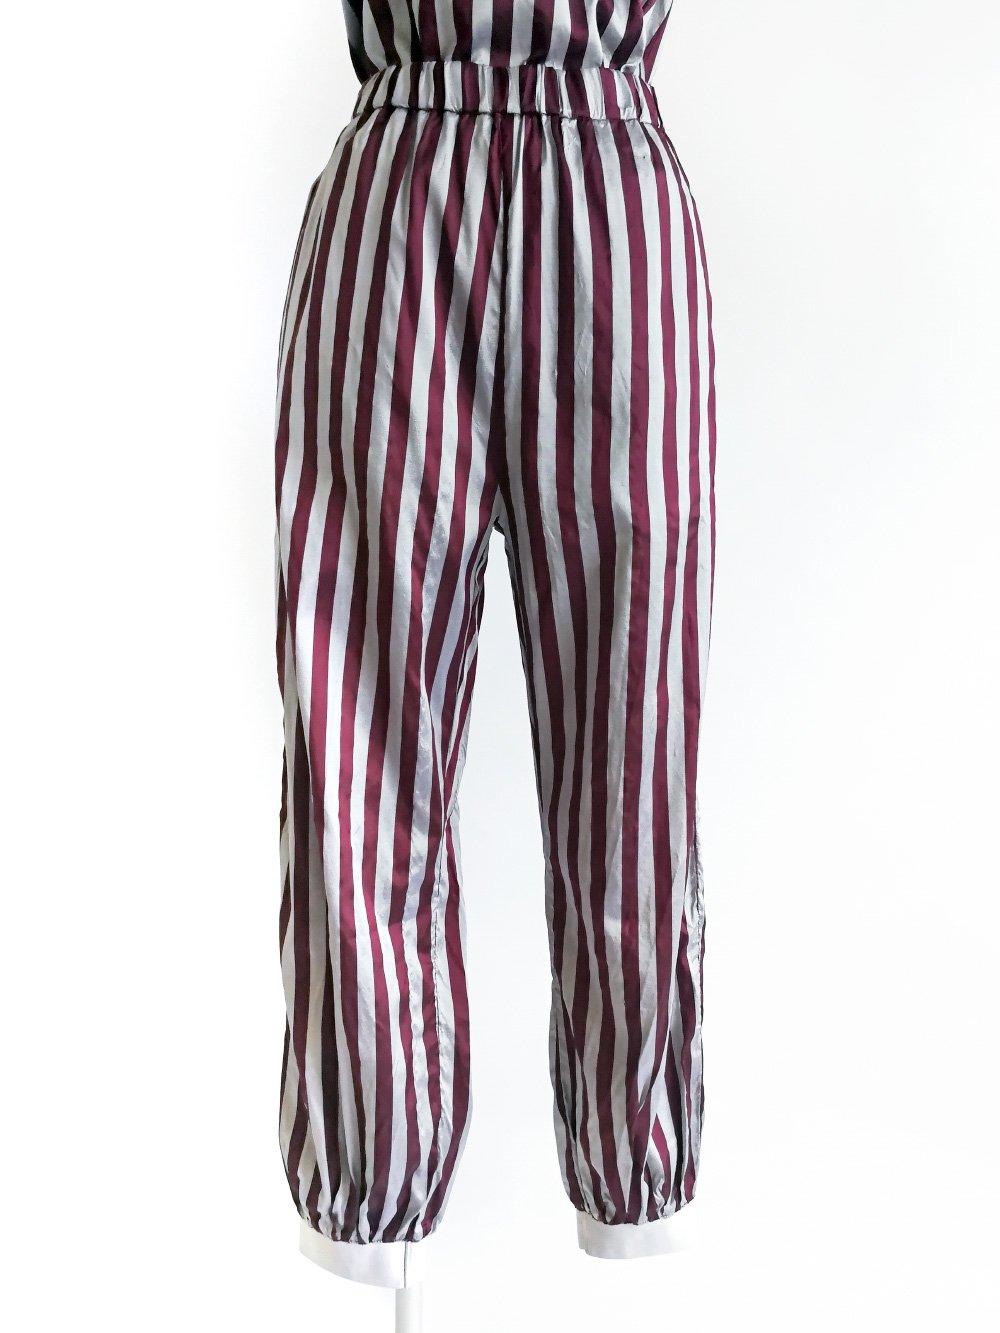 Balloon Pants / original bordeaux